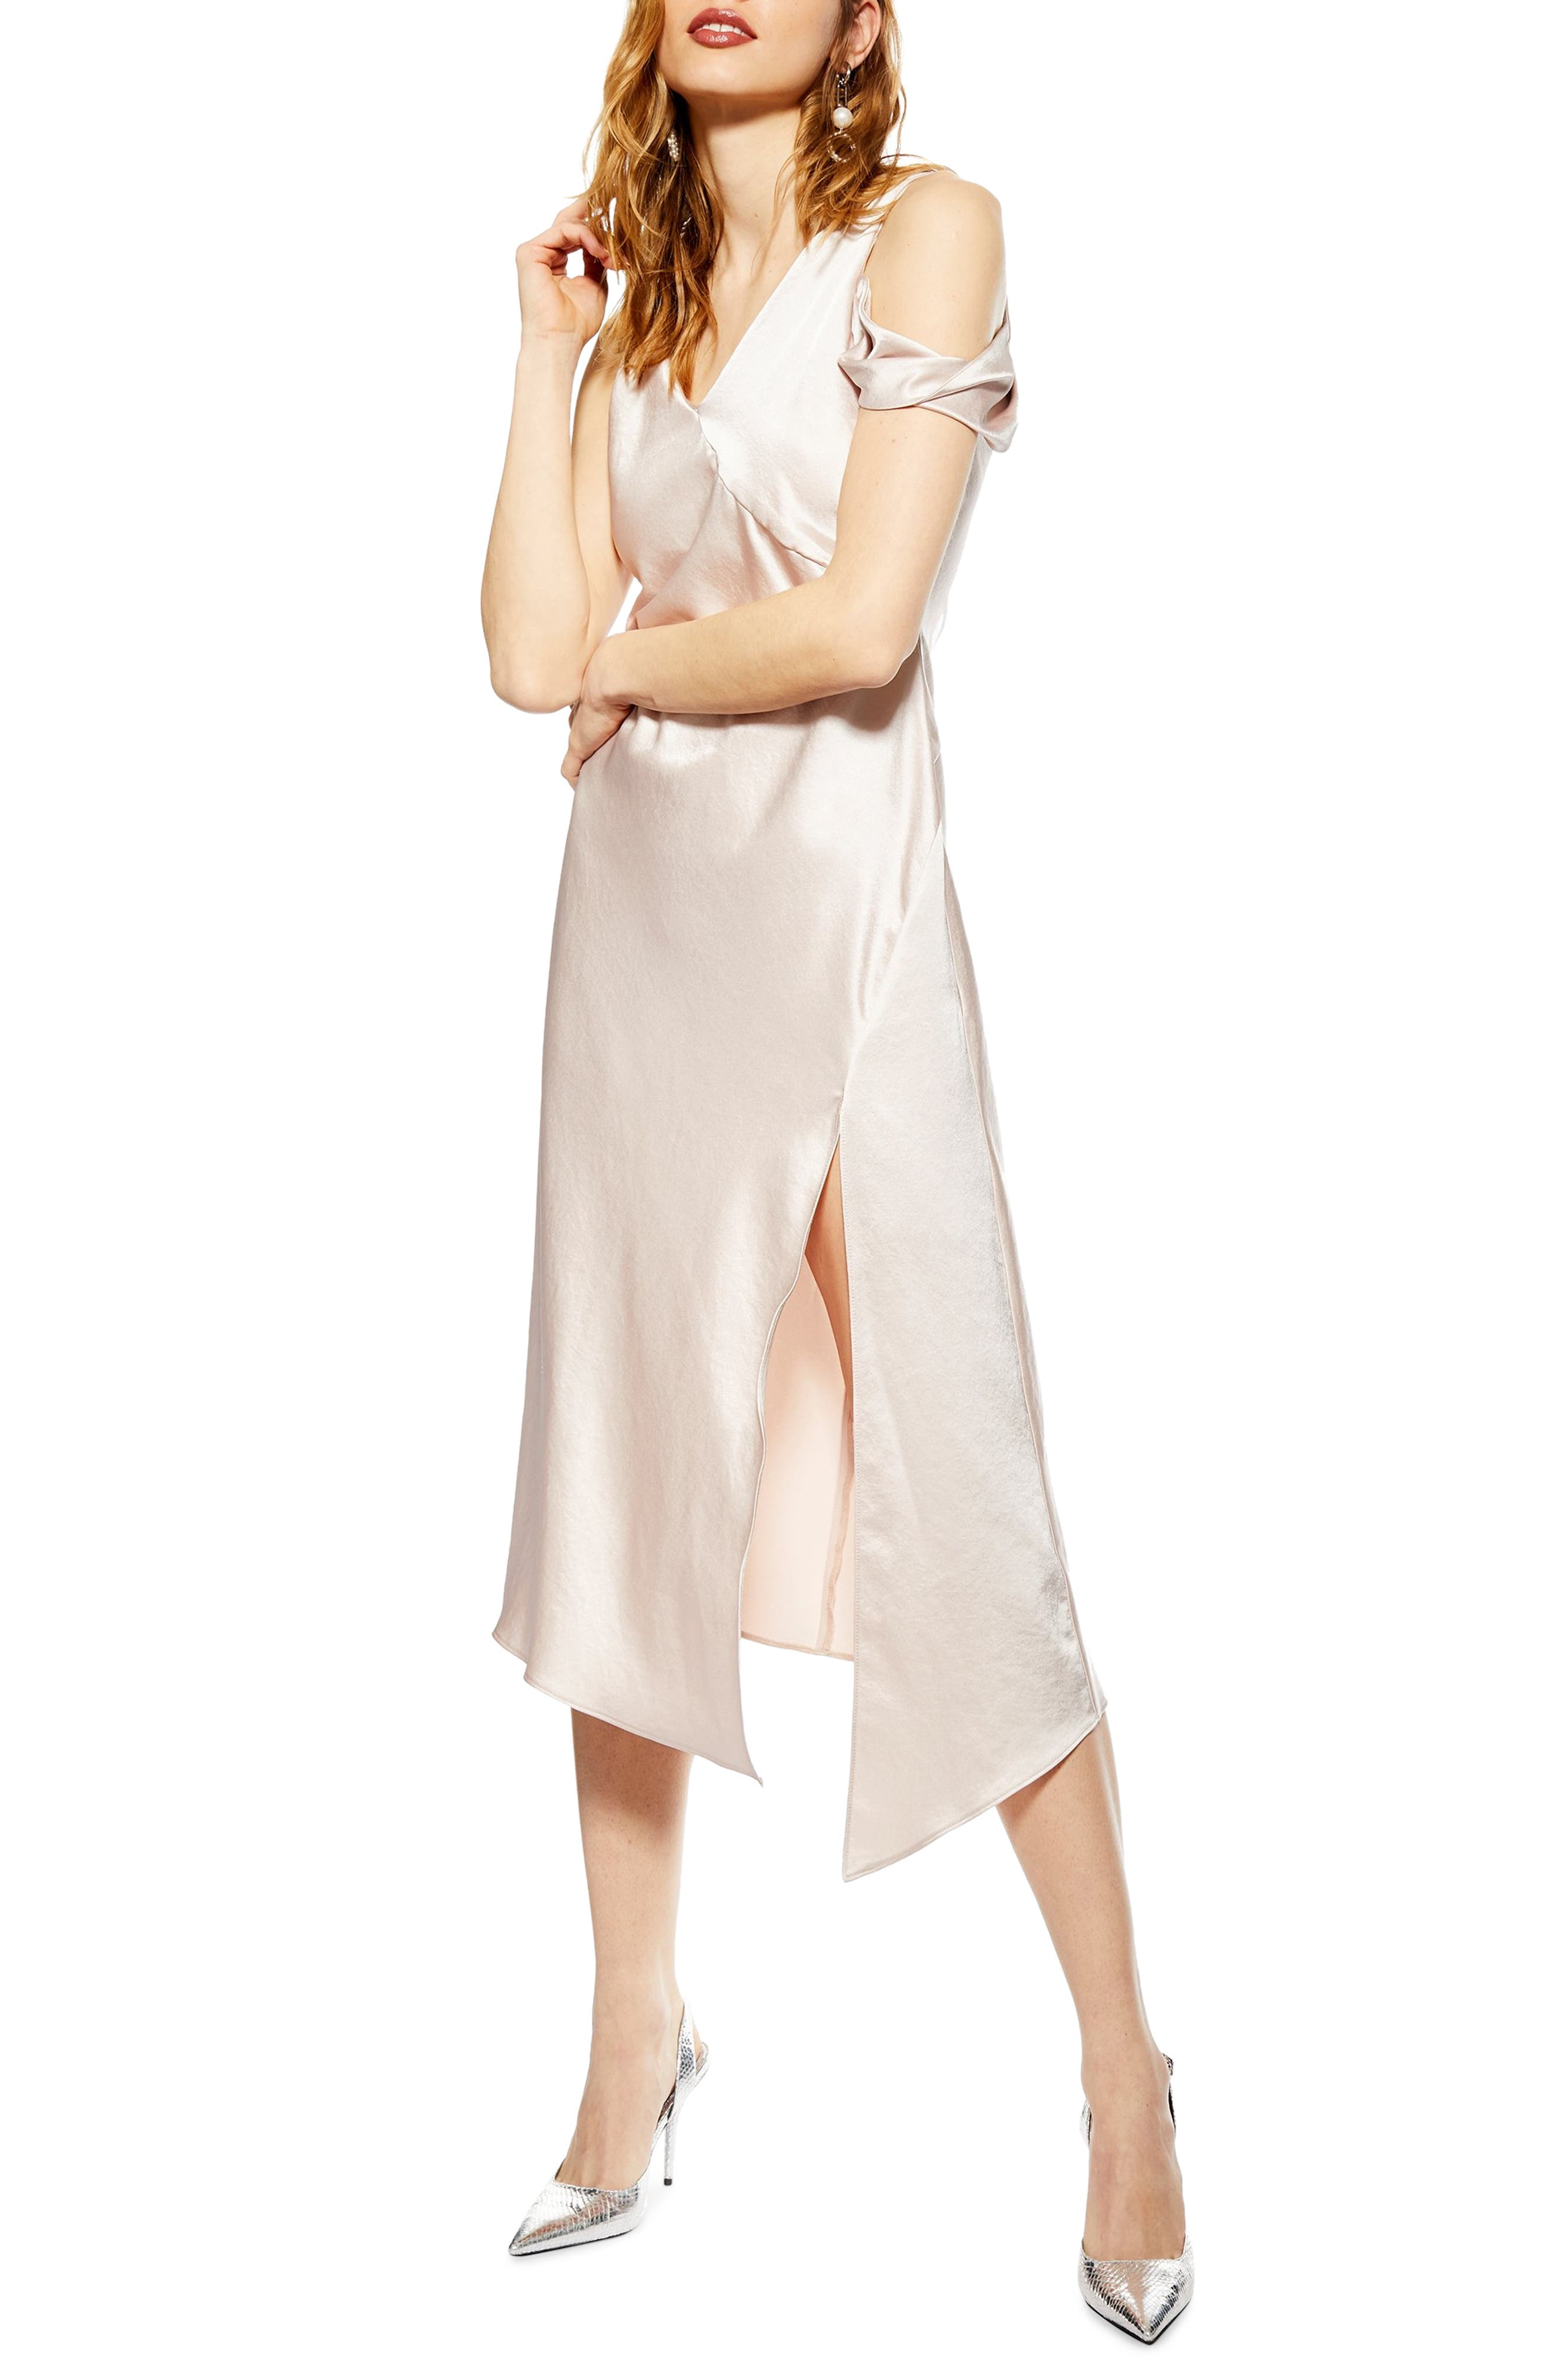 Topshop Twist Shoulder Midi Dress, US (fits like 0) - Beige